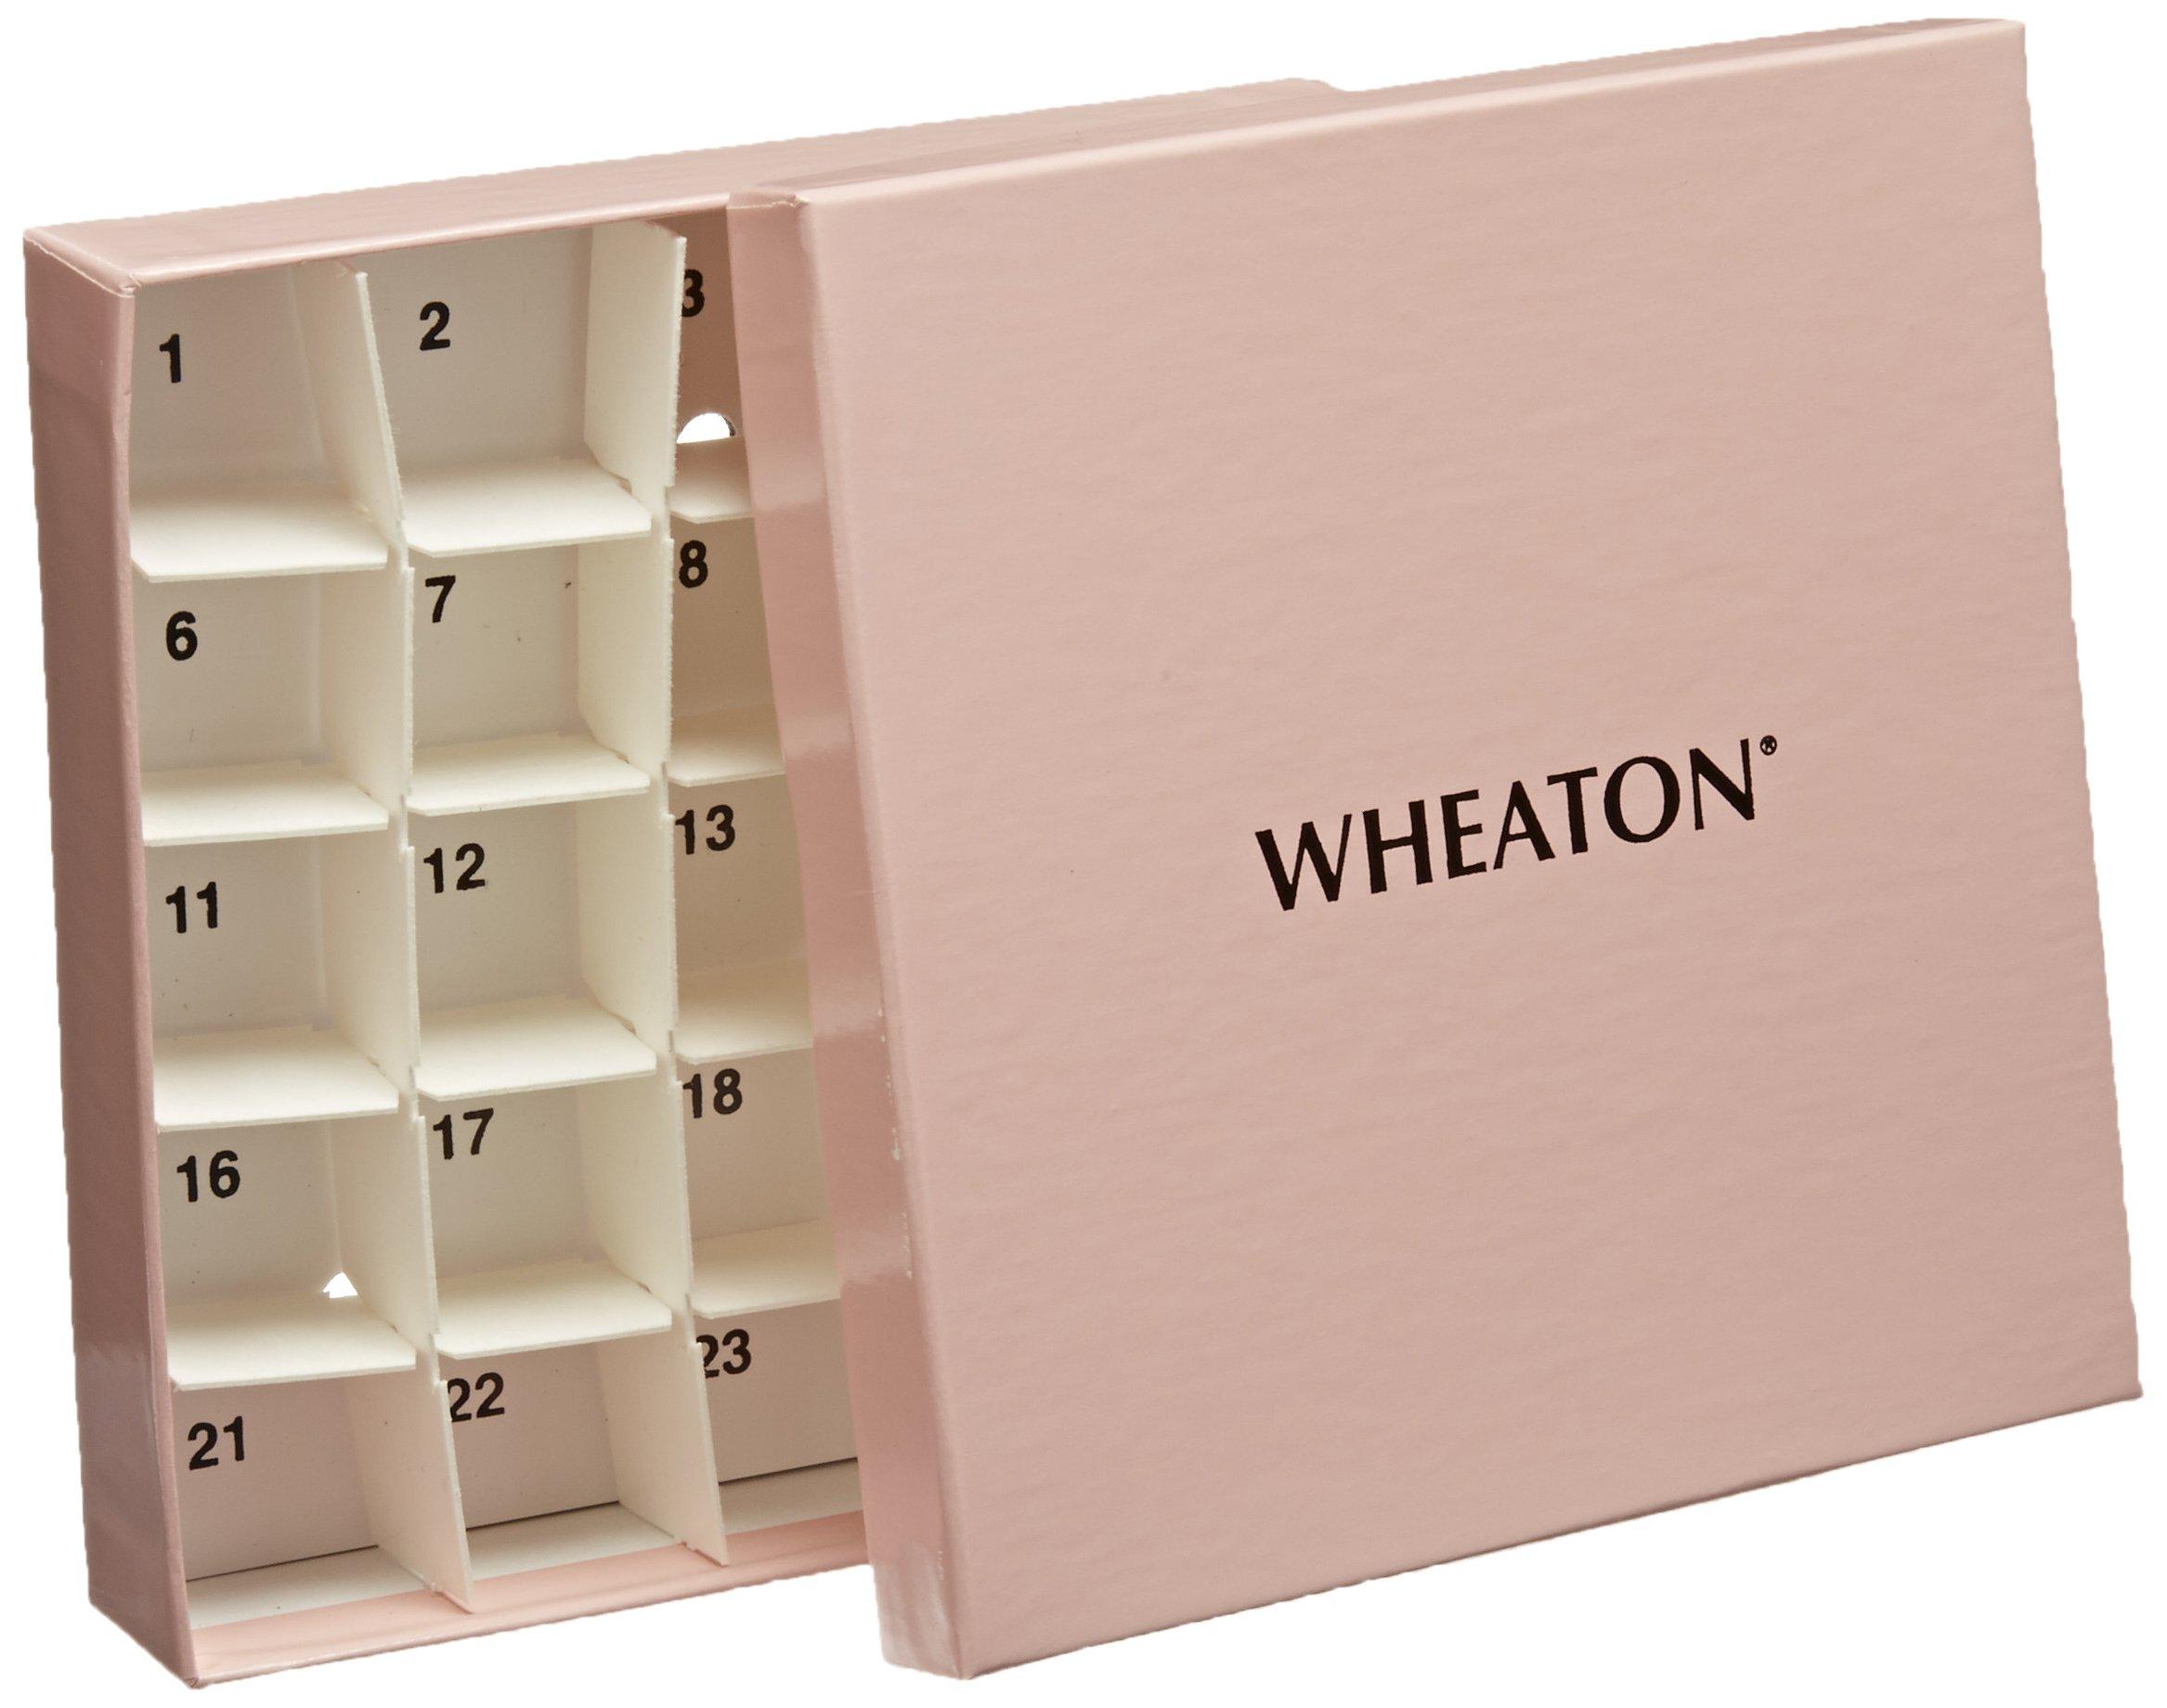 Wheaton W651610-P CryoElite Tissue Vial Box, Pink (Case of 15)